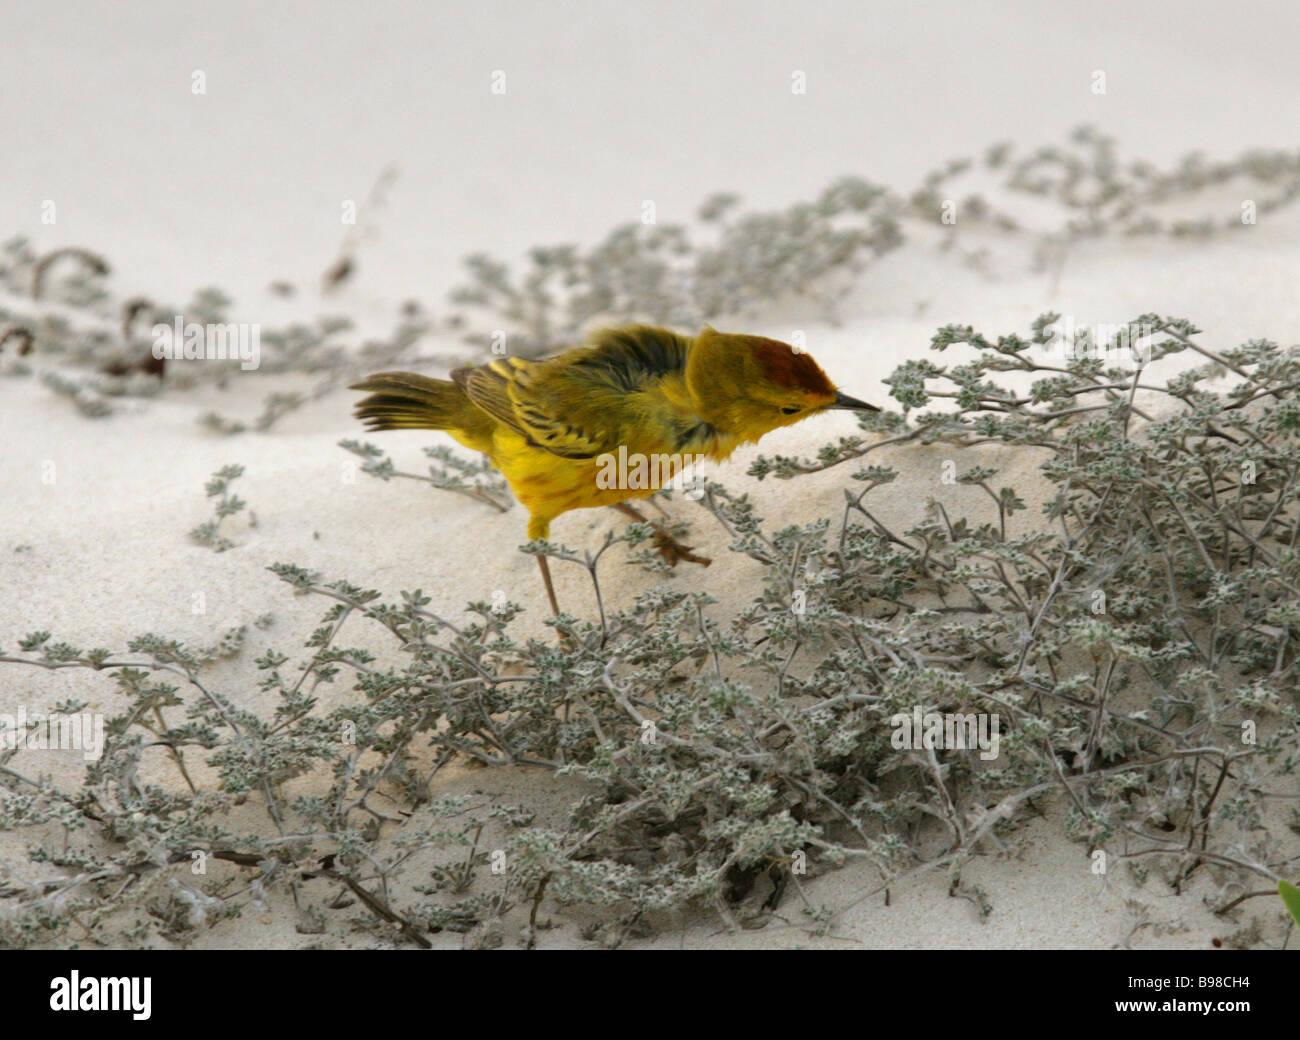 Mangroven oder Gelben Warbler, Dendroica Petechia Aureola, San Cristobal Insel, Galapagos-Inseln, Ecuador, Südamerika Stockbild